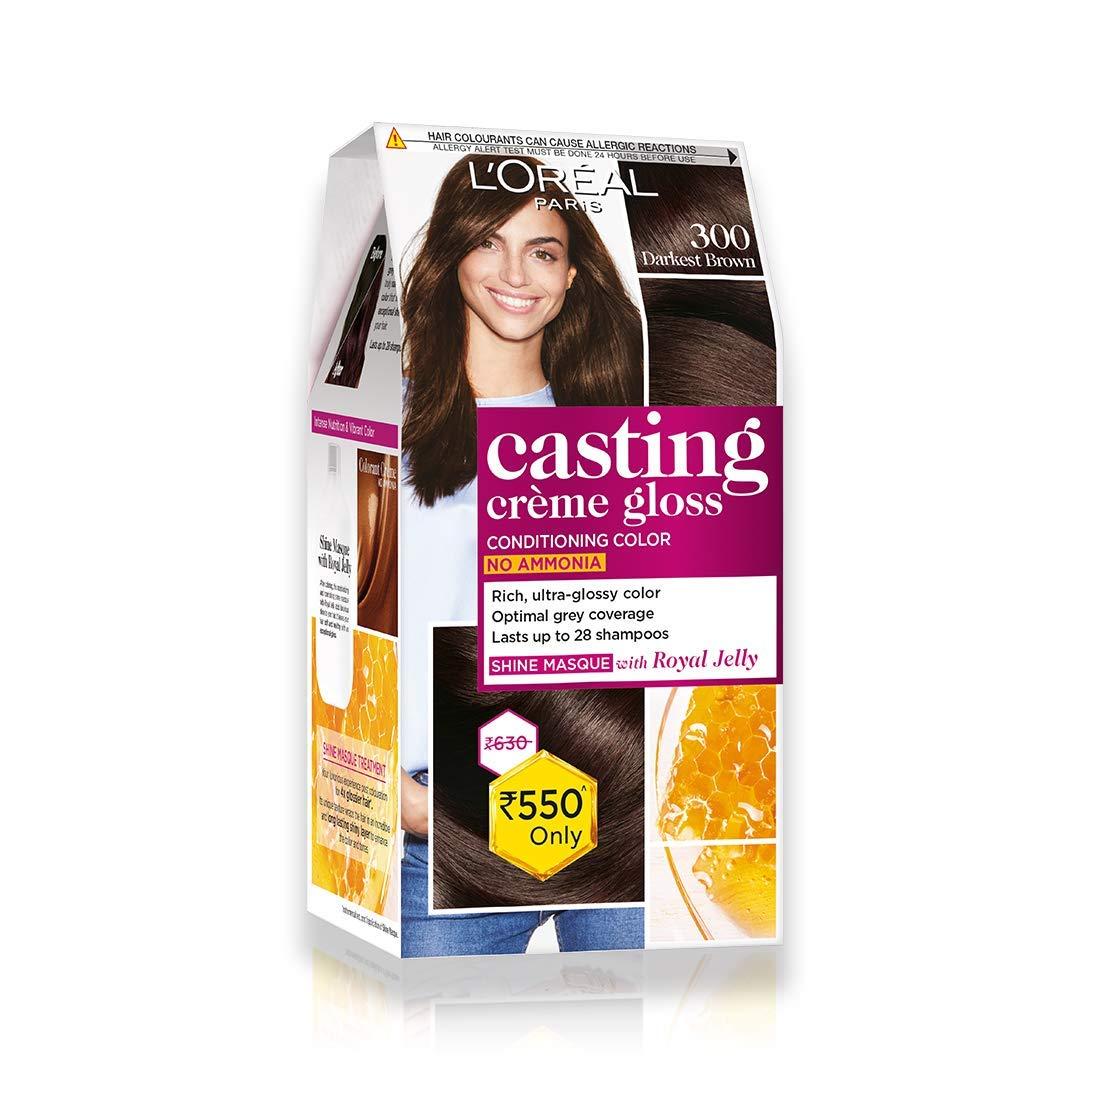 L'Oreal Paris Casting Creme Gloss Hair Color, Darkest Brown